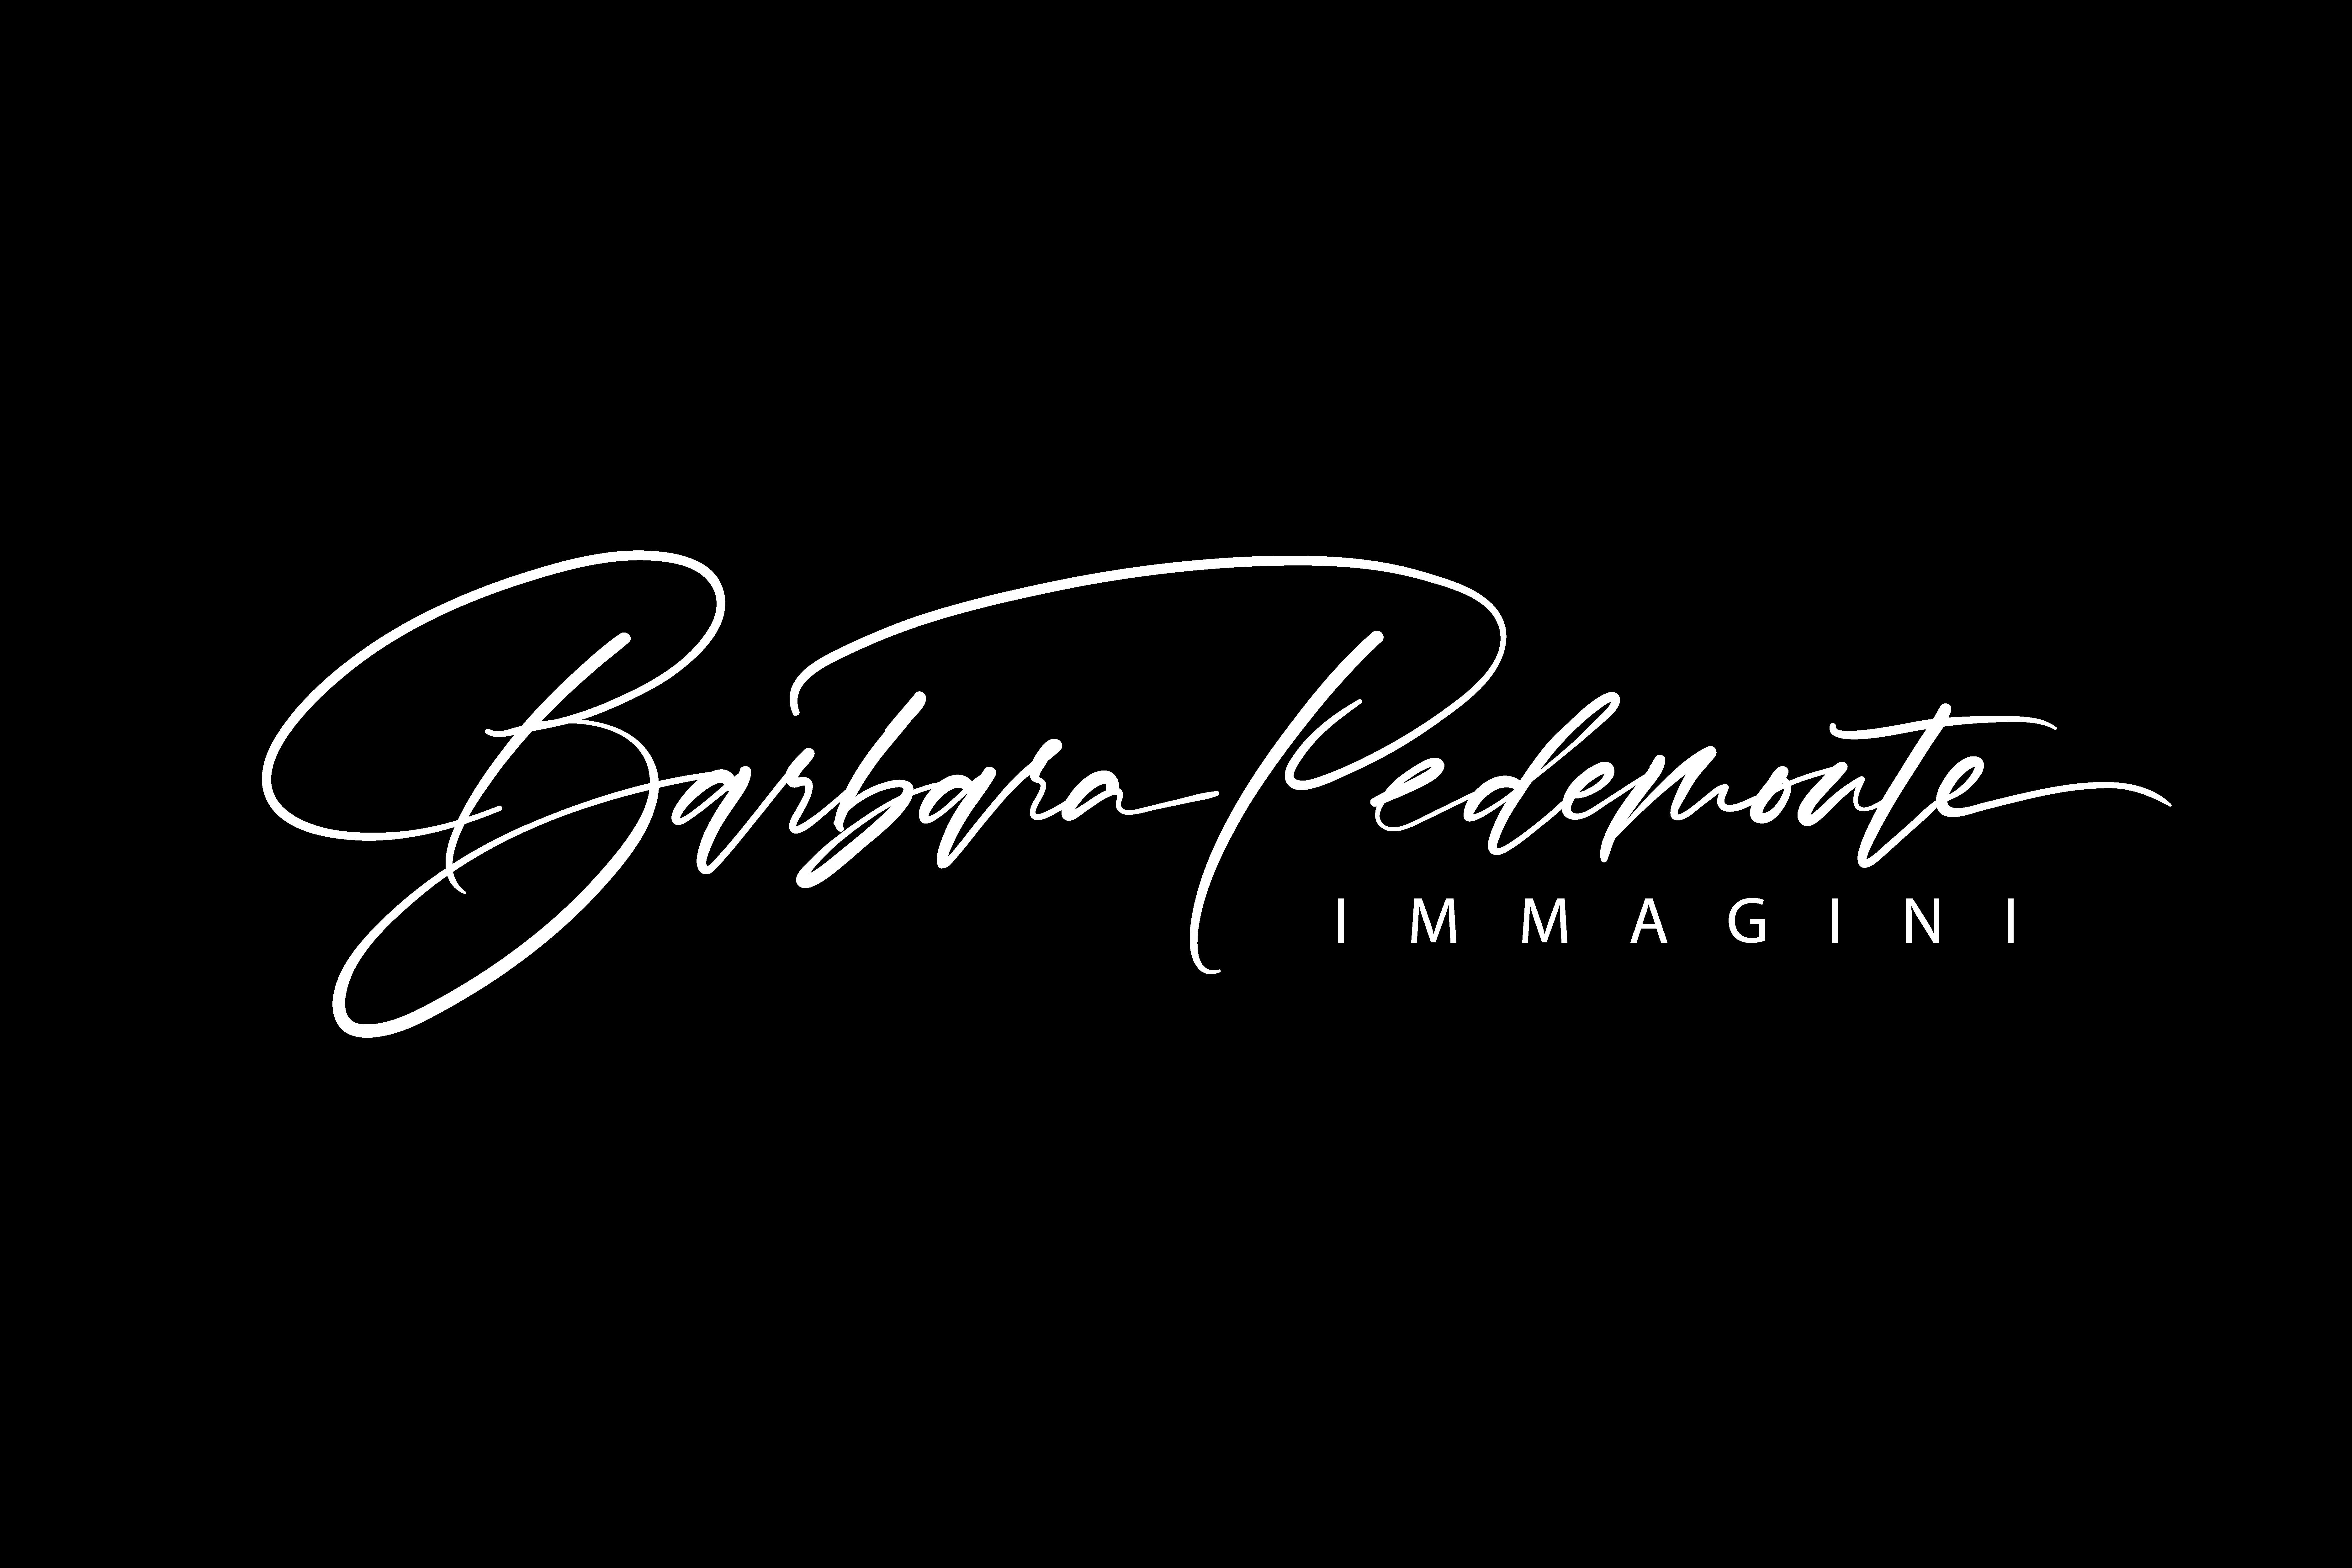 Barbara Pedemonte